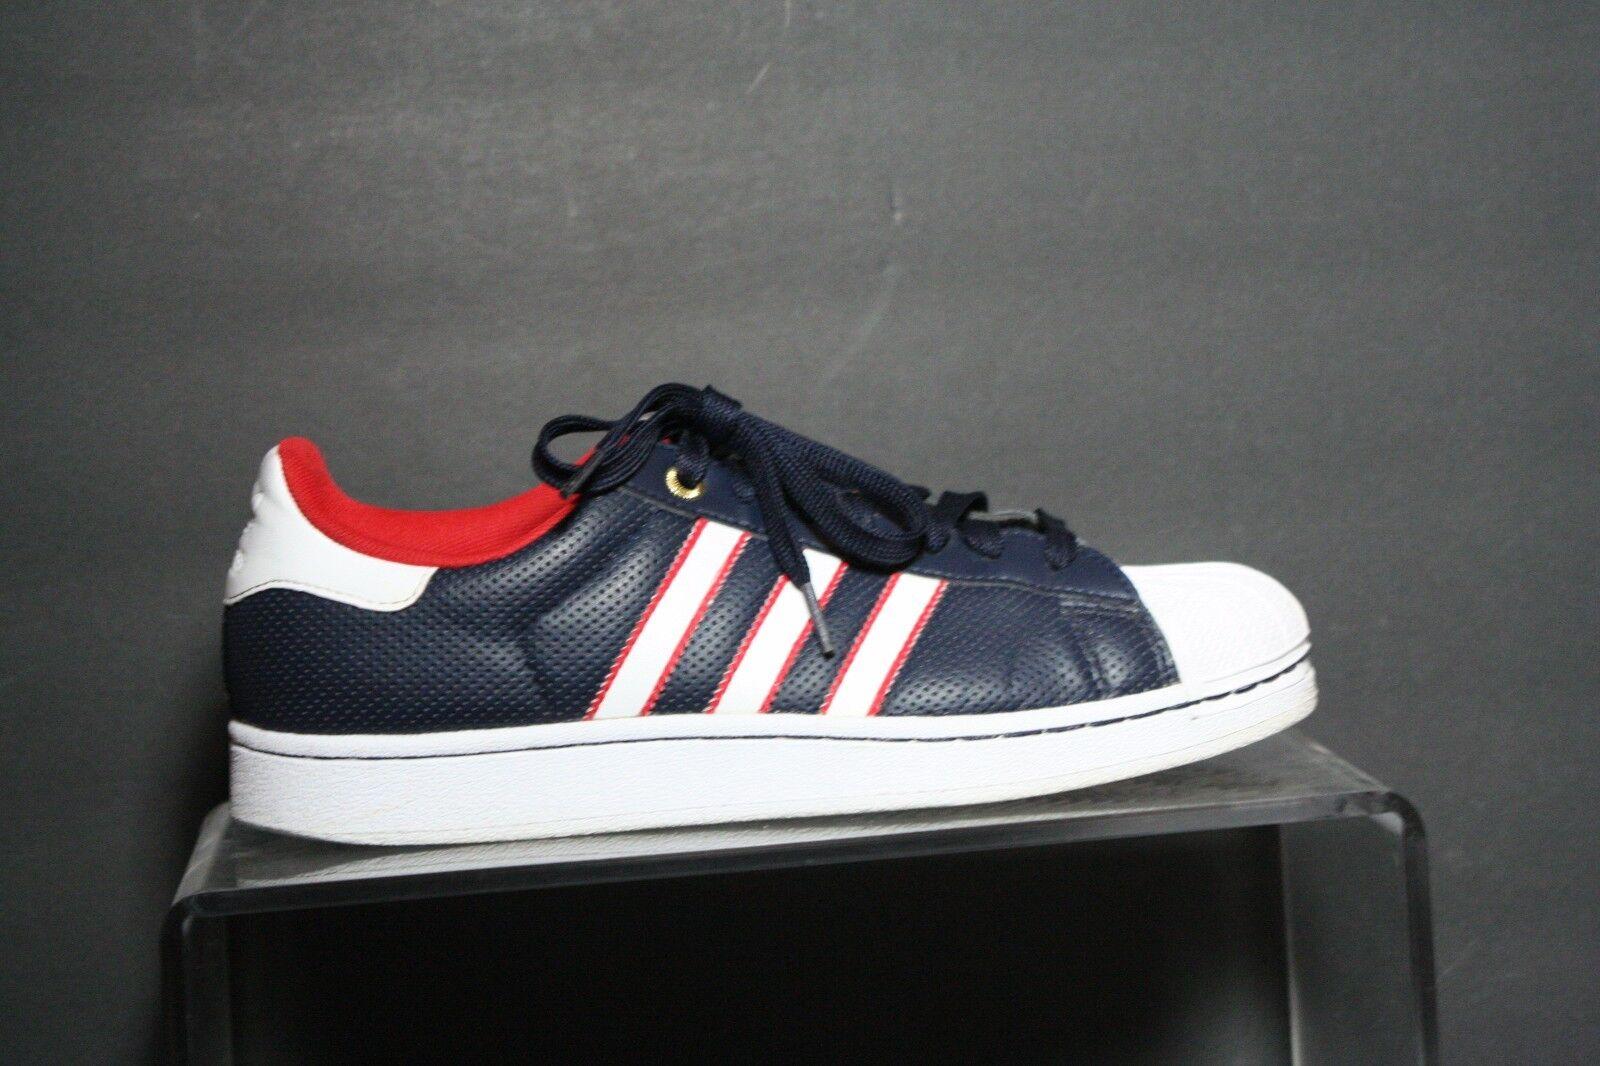 Adidas Superstar 2 USA Sneaker 2014 Multi Red White bluee Men 8 Athletic Hip Rare